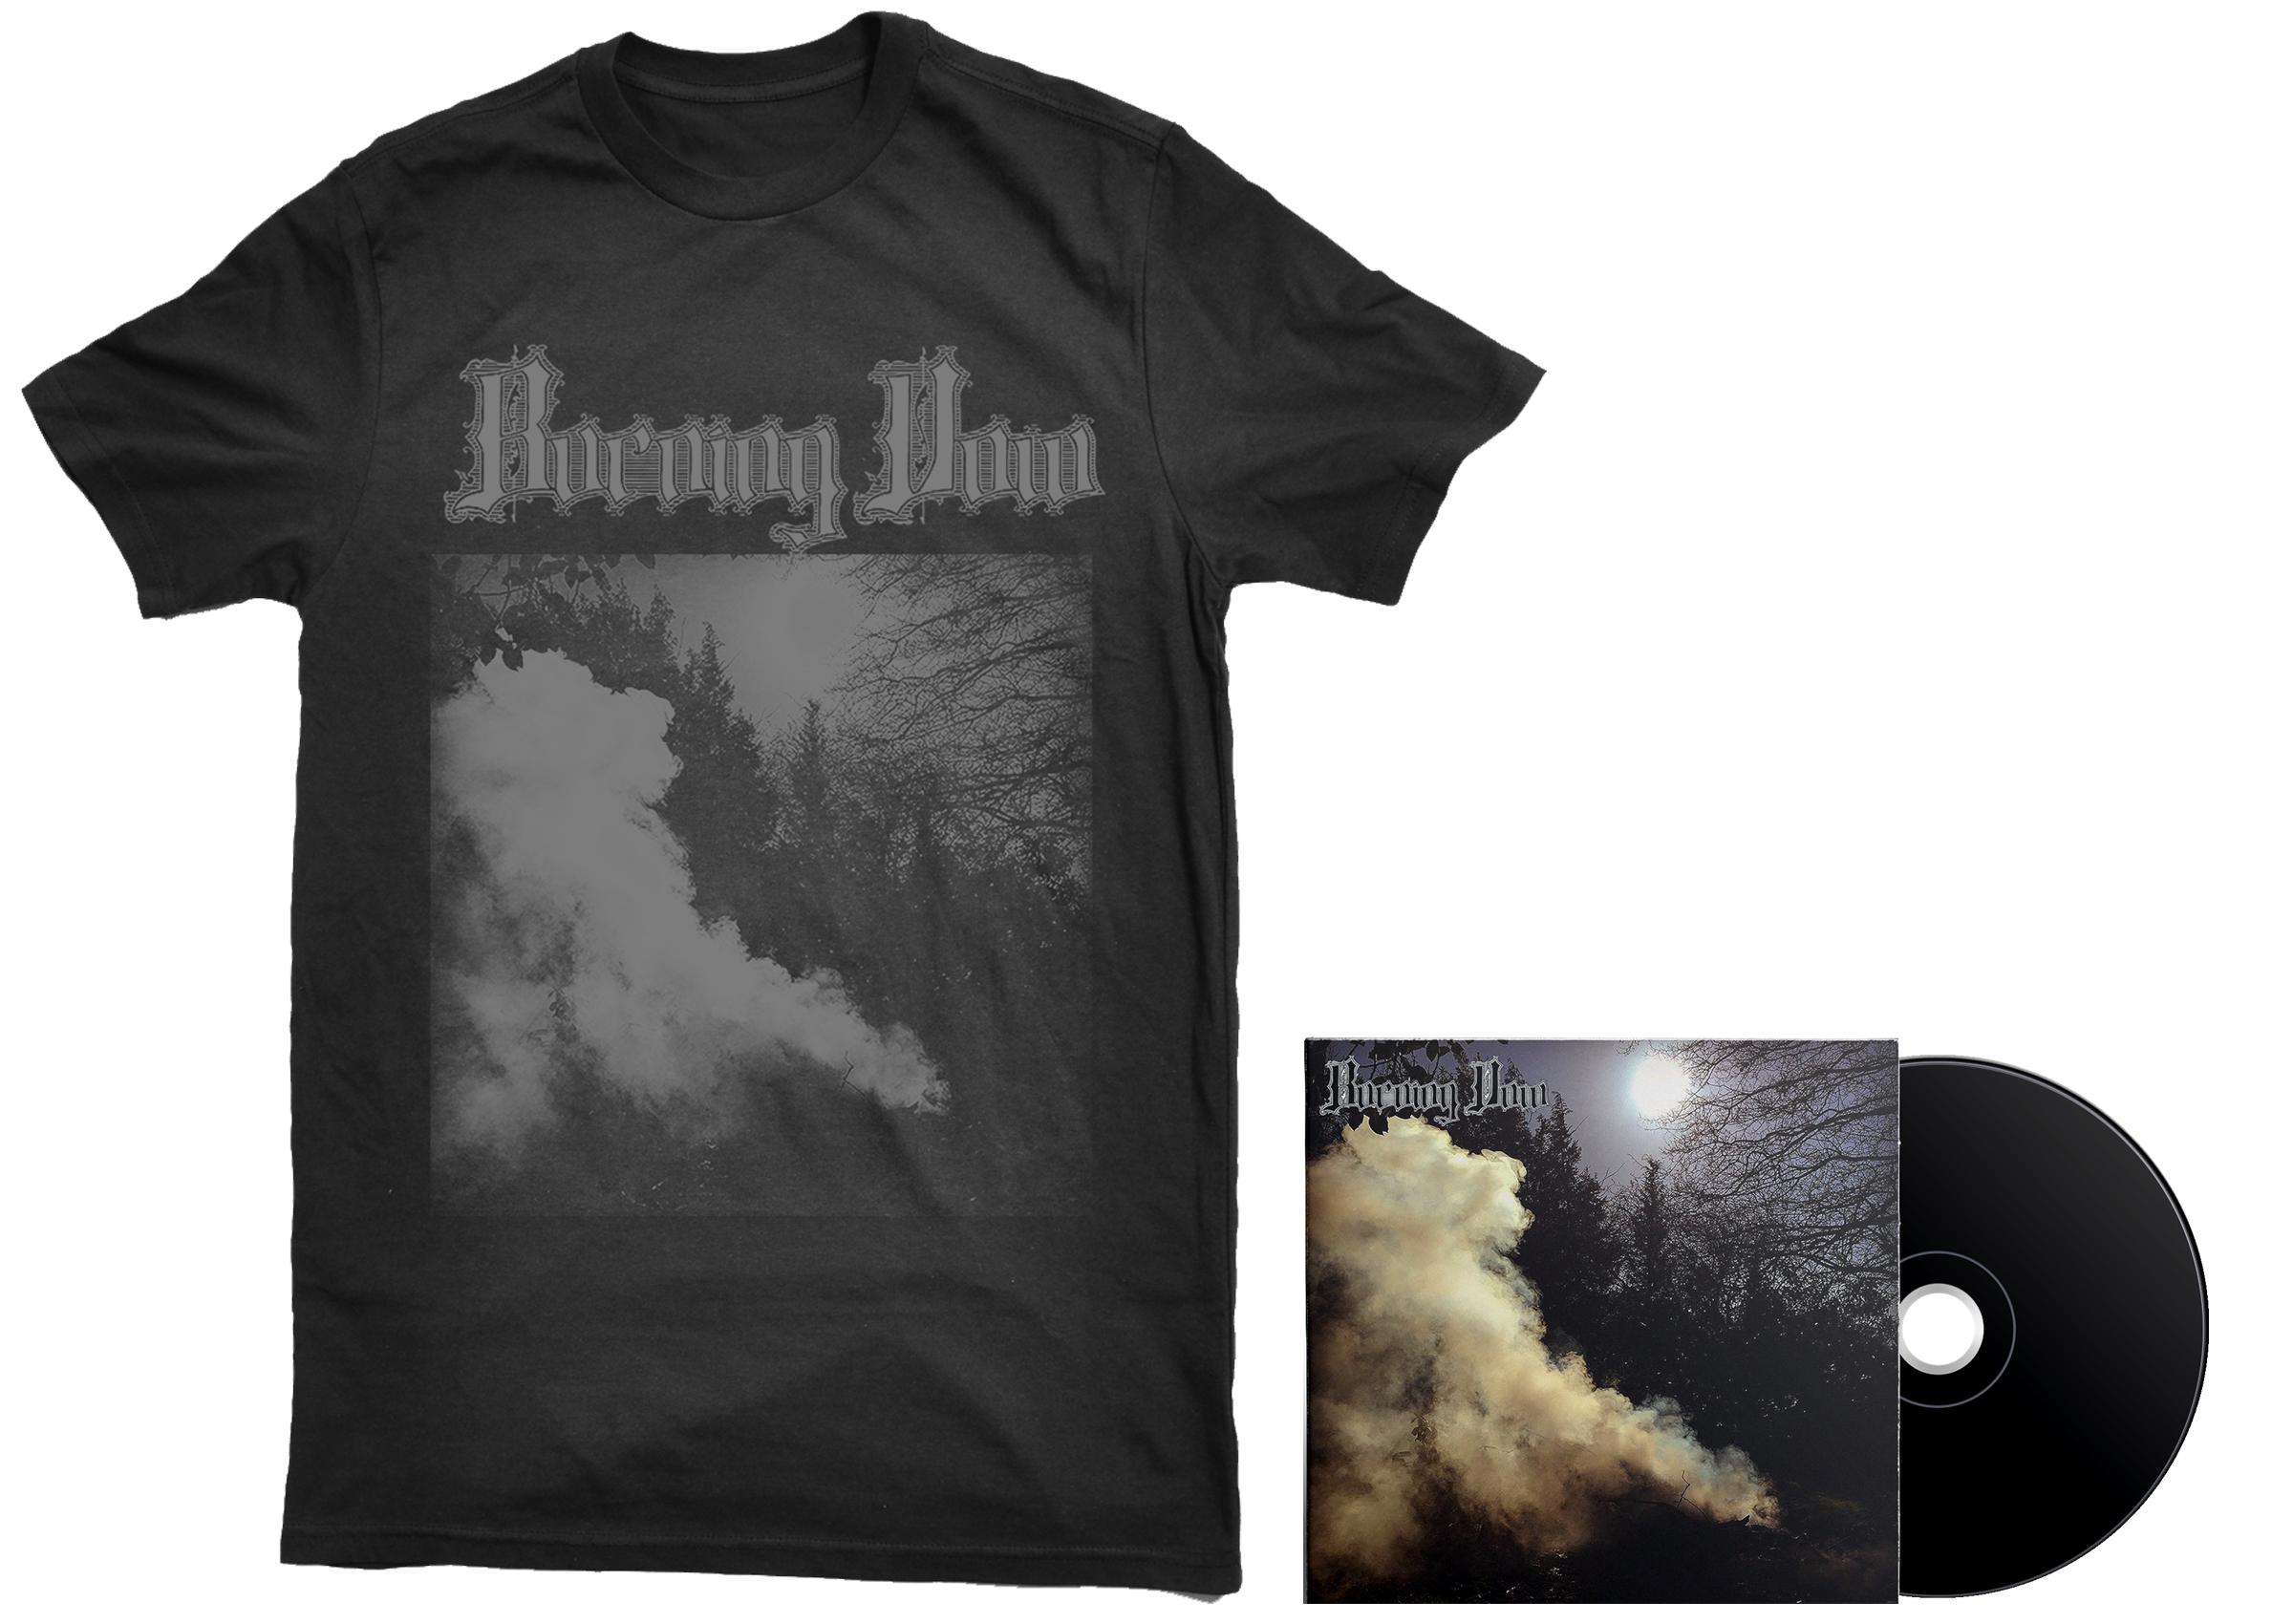 Burning Vow - S/T shirt + CD